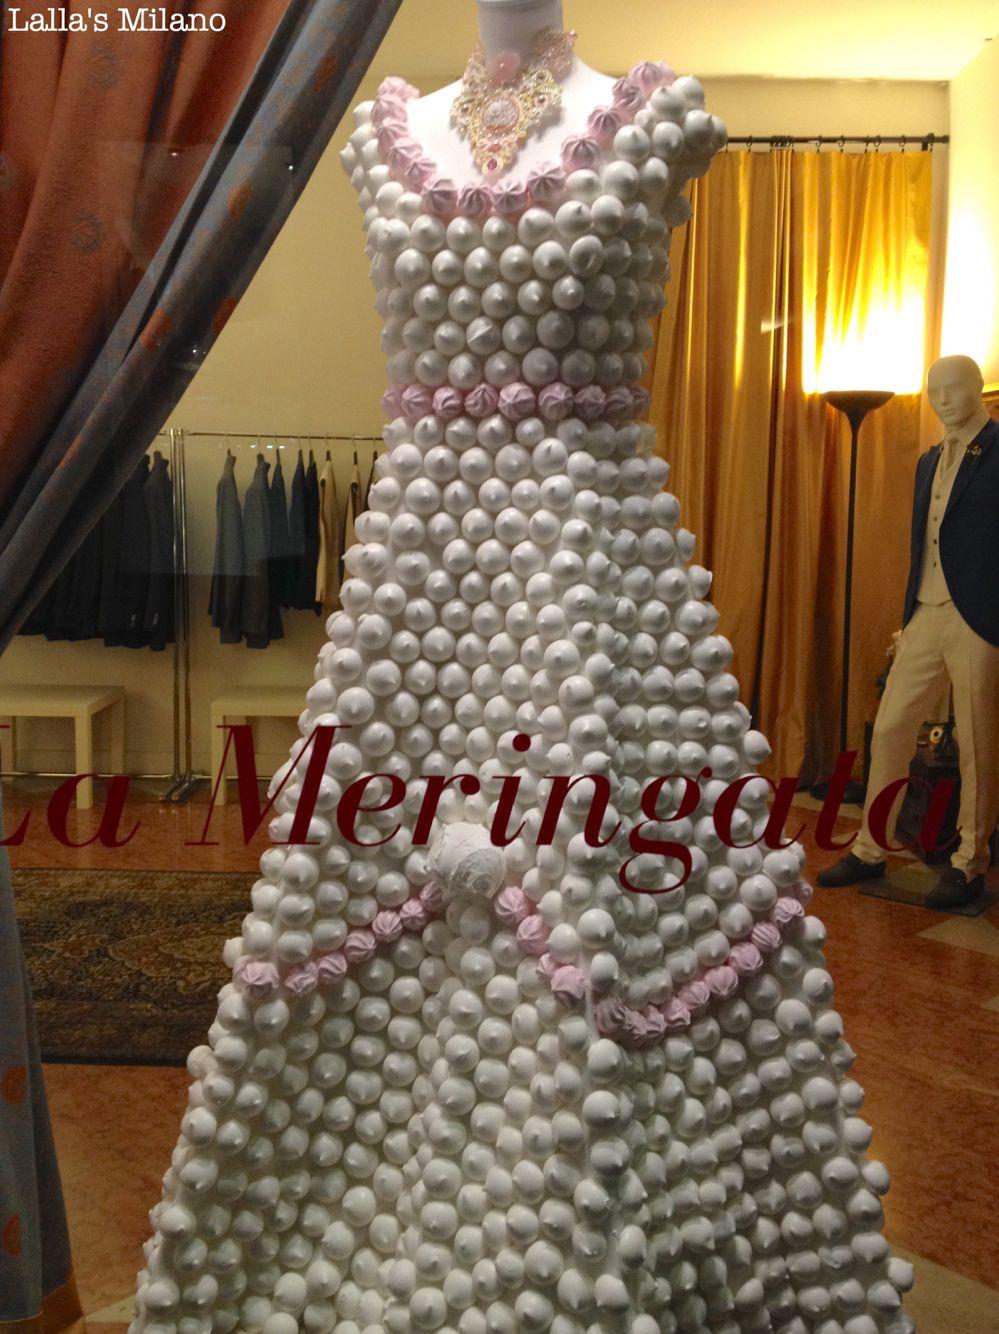 Via San Maurilio Milano want a meringue dress? in milan you can! #lameringata